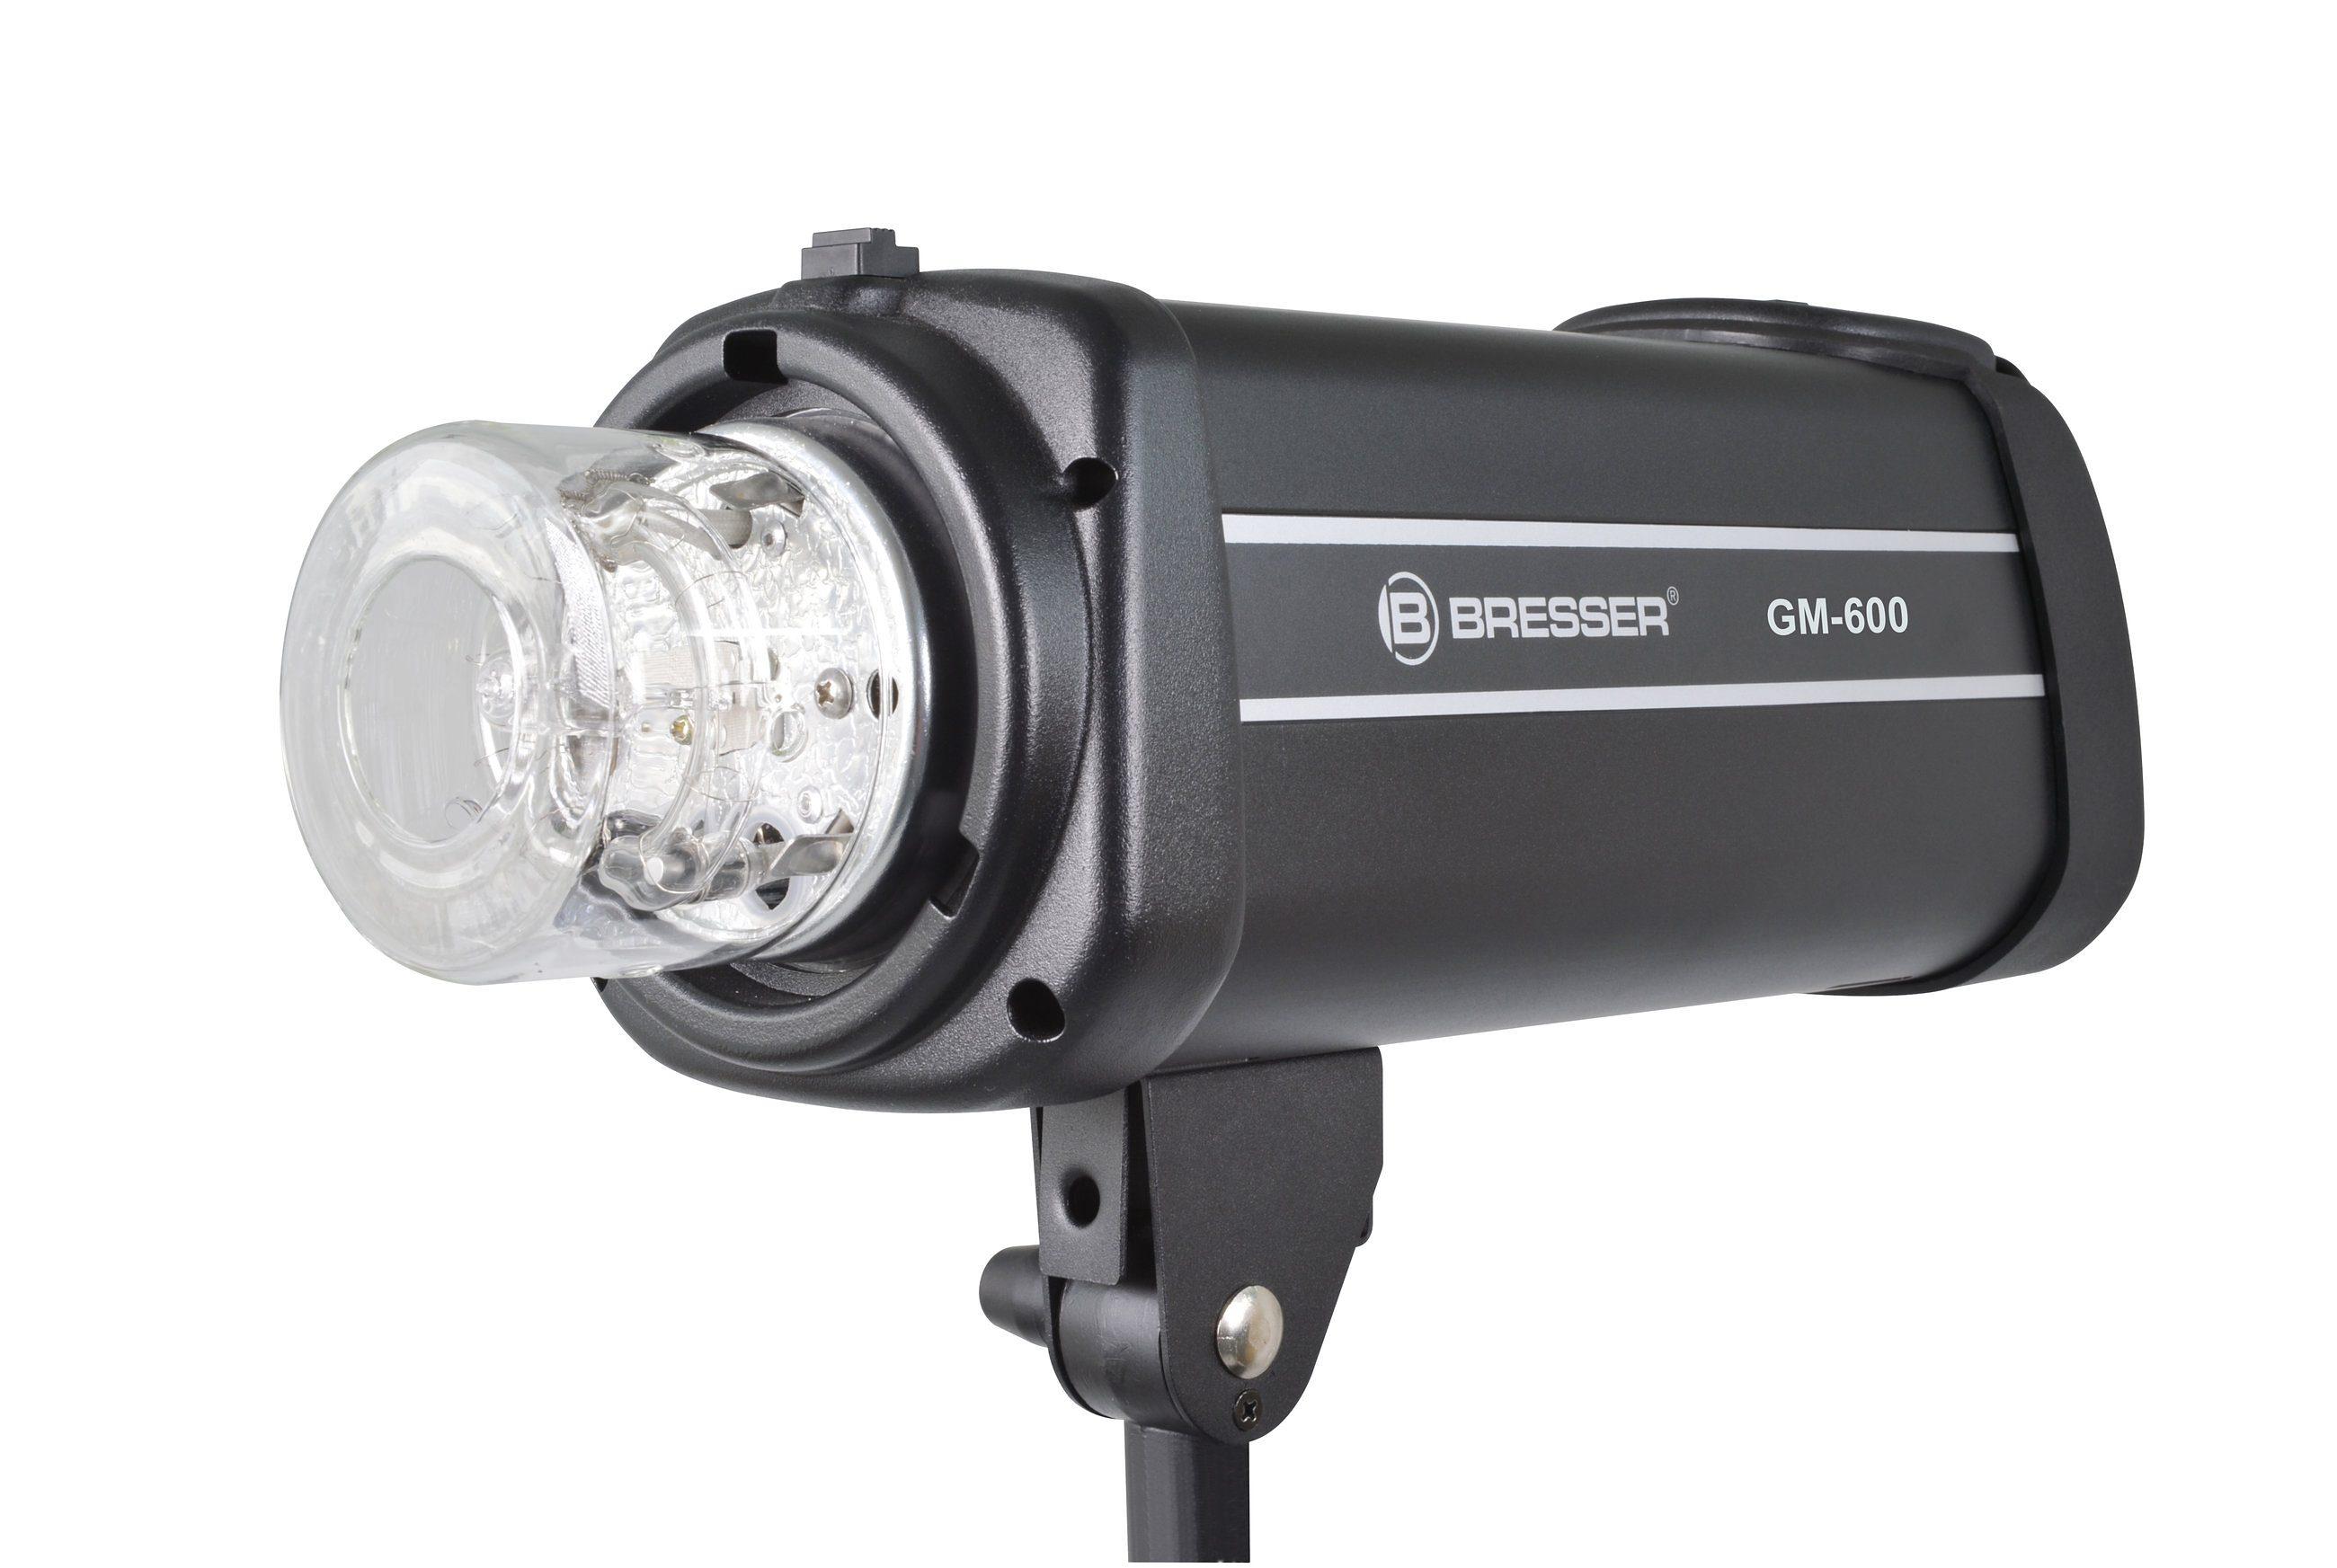 BRESSER Fotostudio »BRESSER GM-600 digitaler Studioblitz«